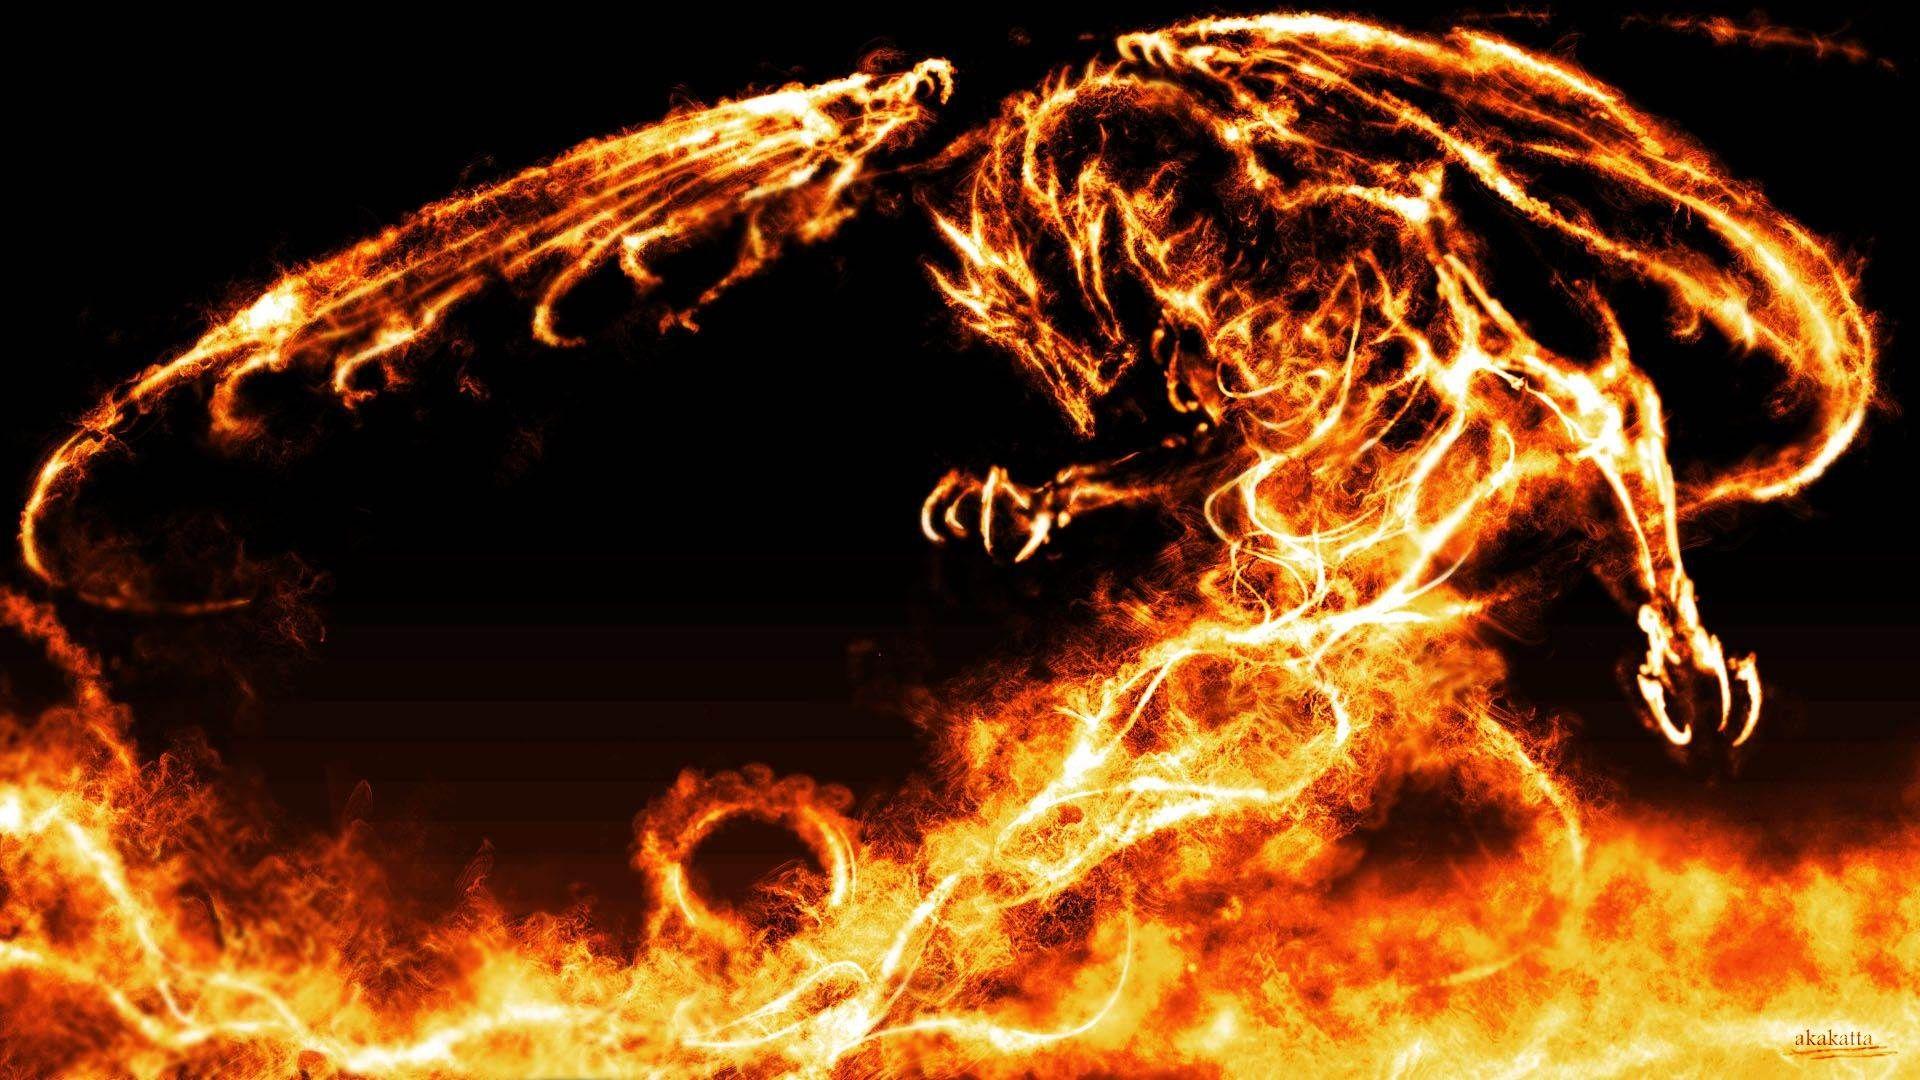 Dragon lore wallpaper wallpapersafari - Black Dragon Wallpapers Hd Group 1920 1080 Dragon Pictures Adorable Wallpapers